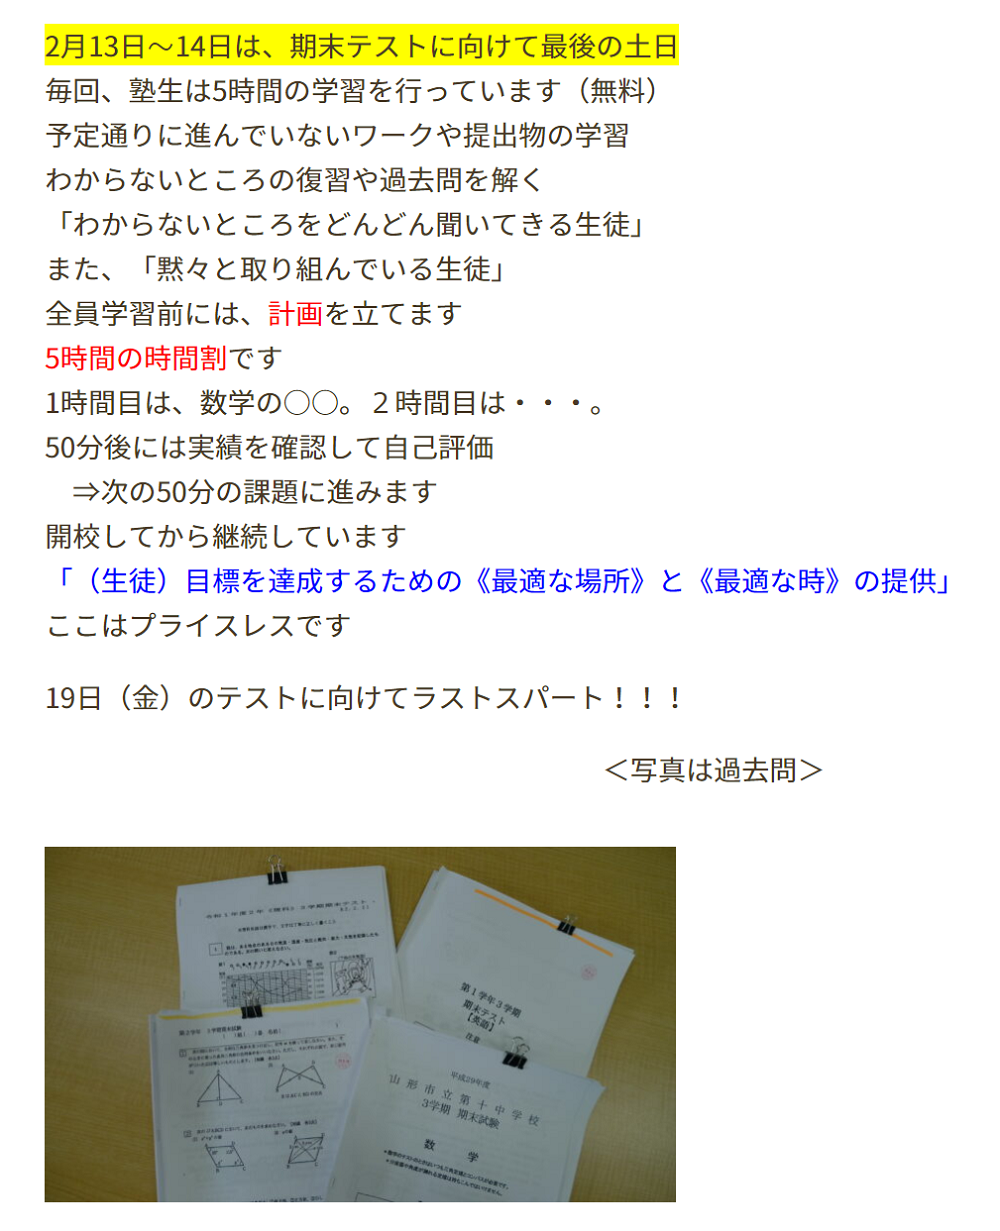 【SELMO山形南教室】期末テスト対策学習会 開催